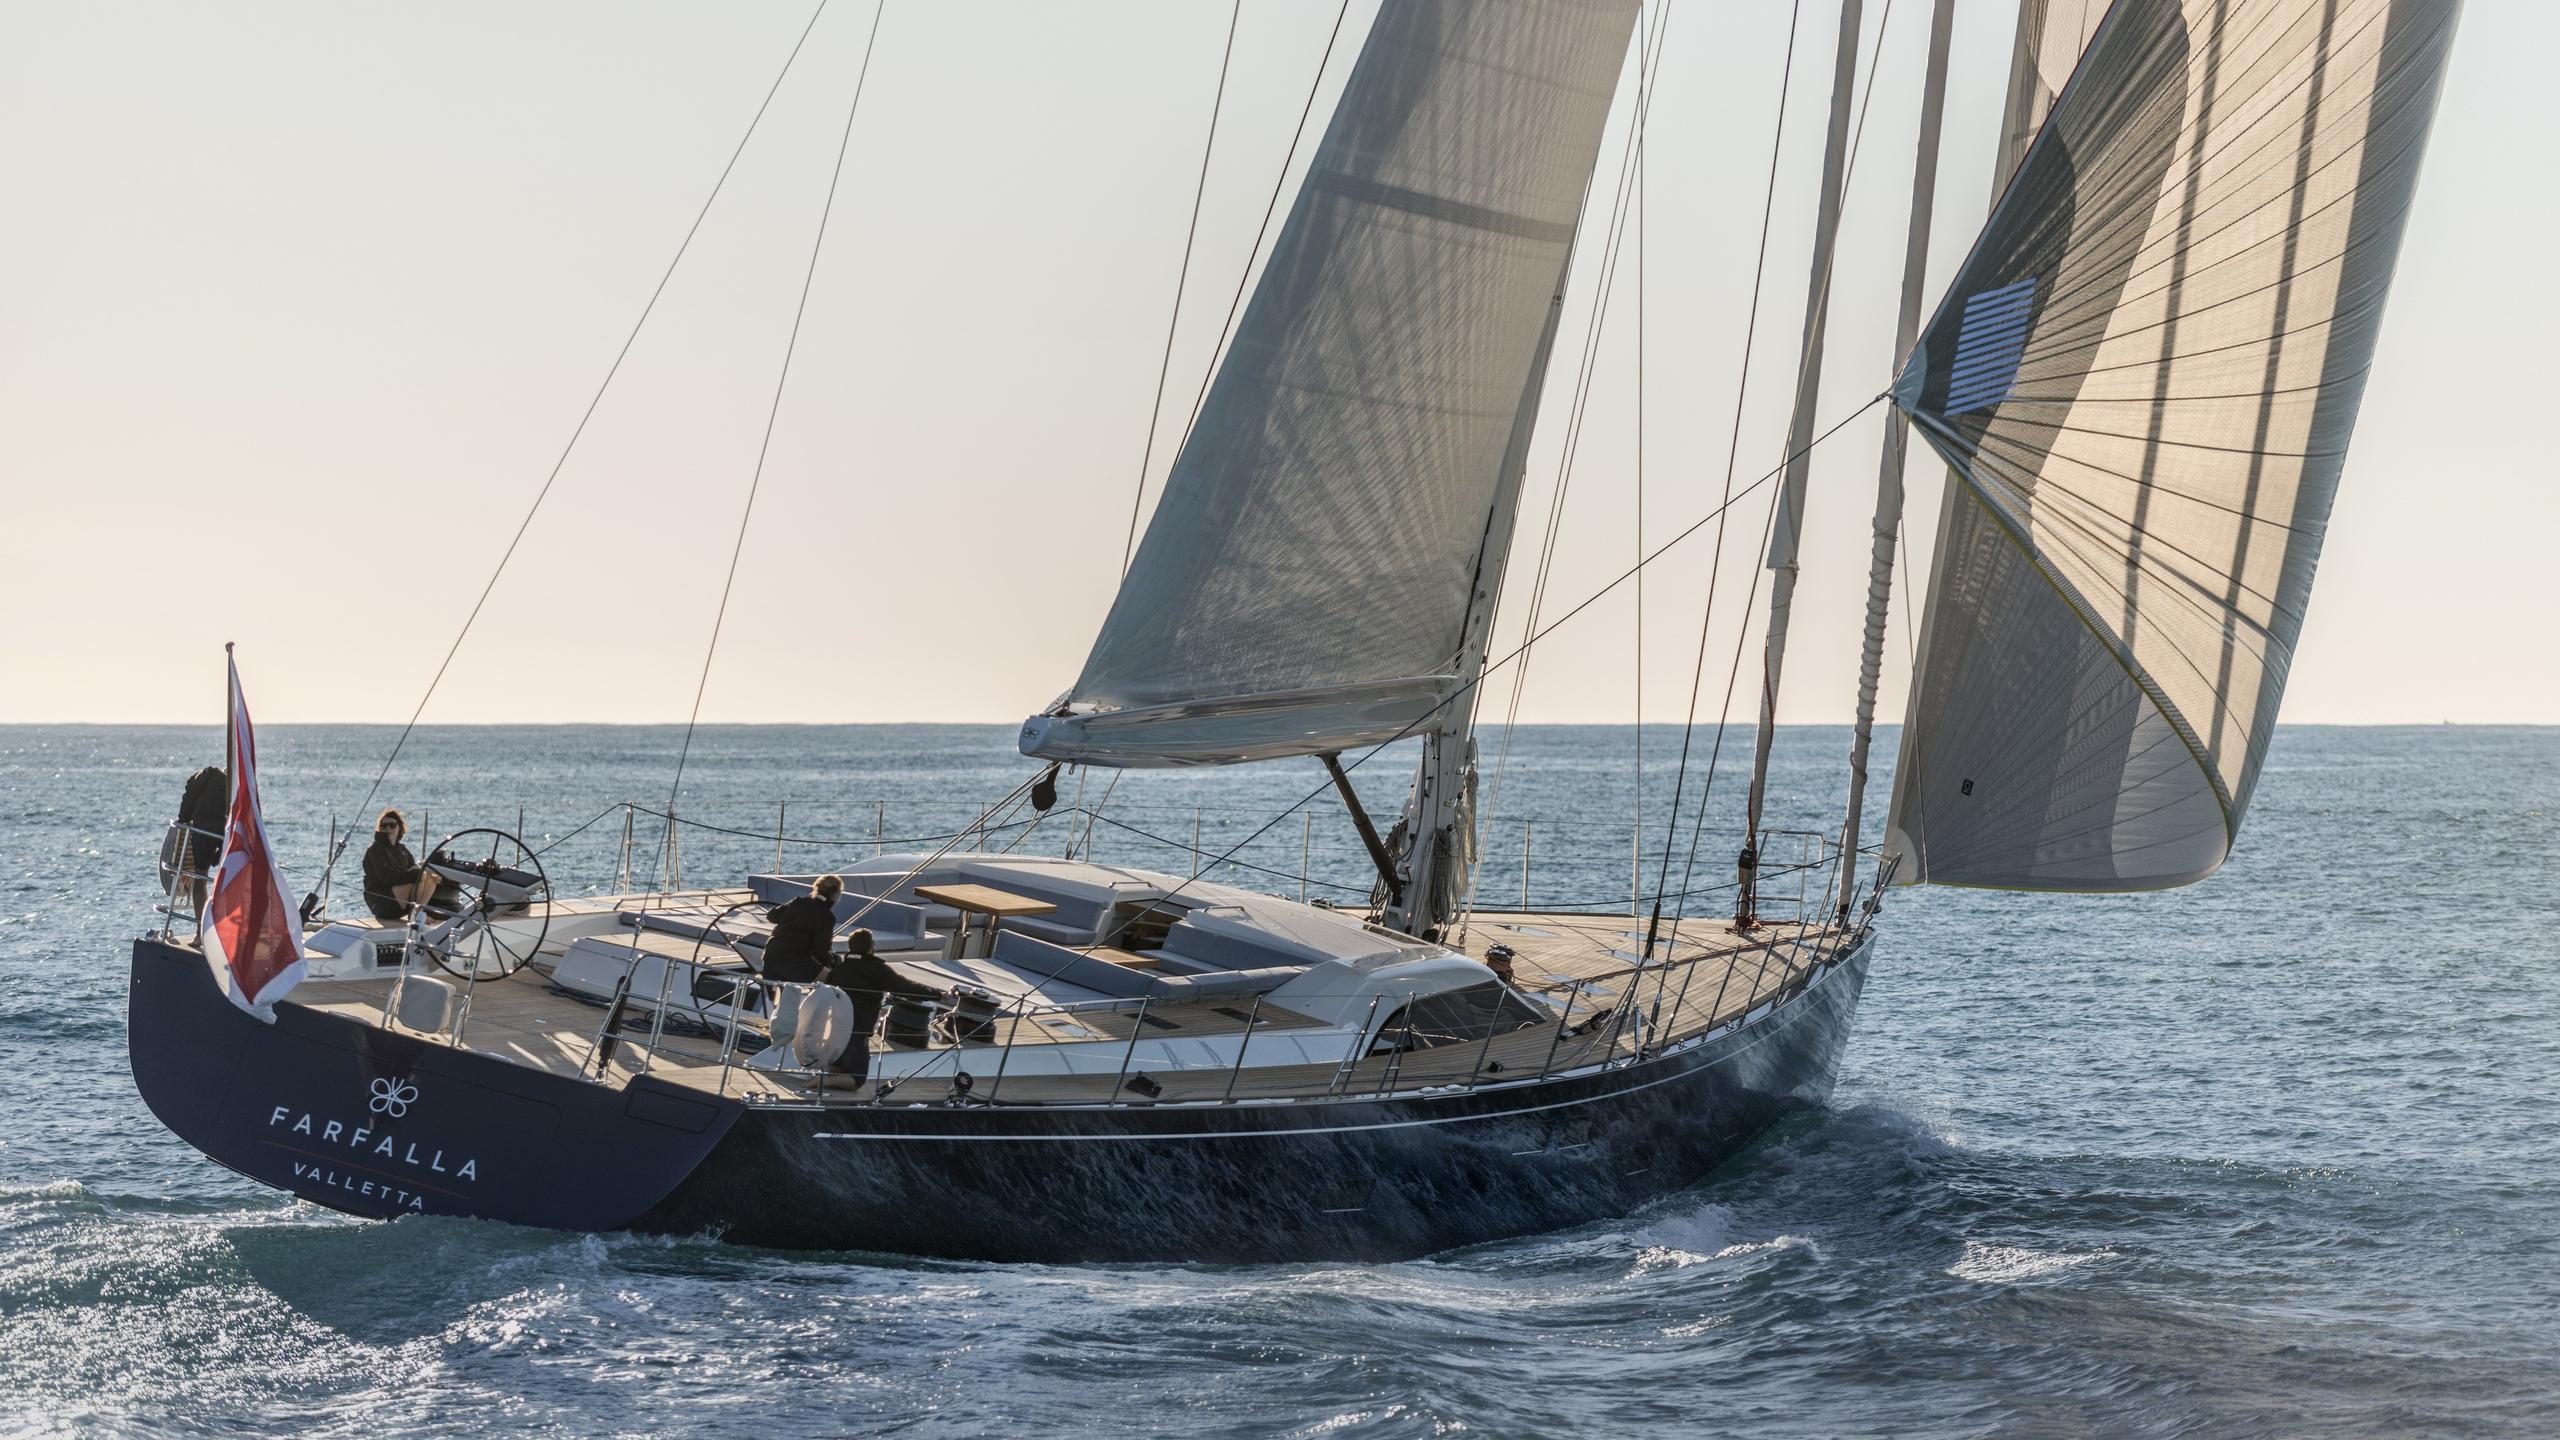 farfalla-sailing-yacht-southern-wind-2014-32m-cruising-stern